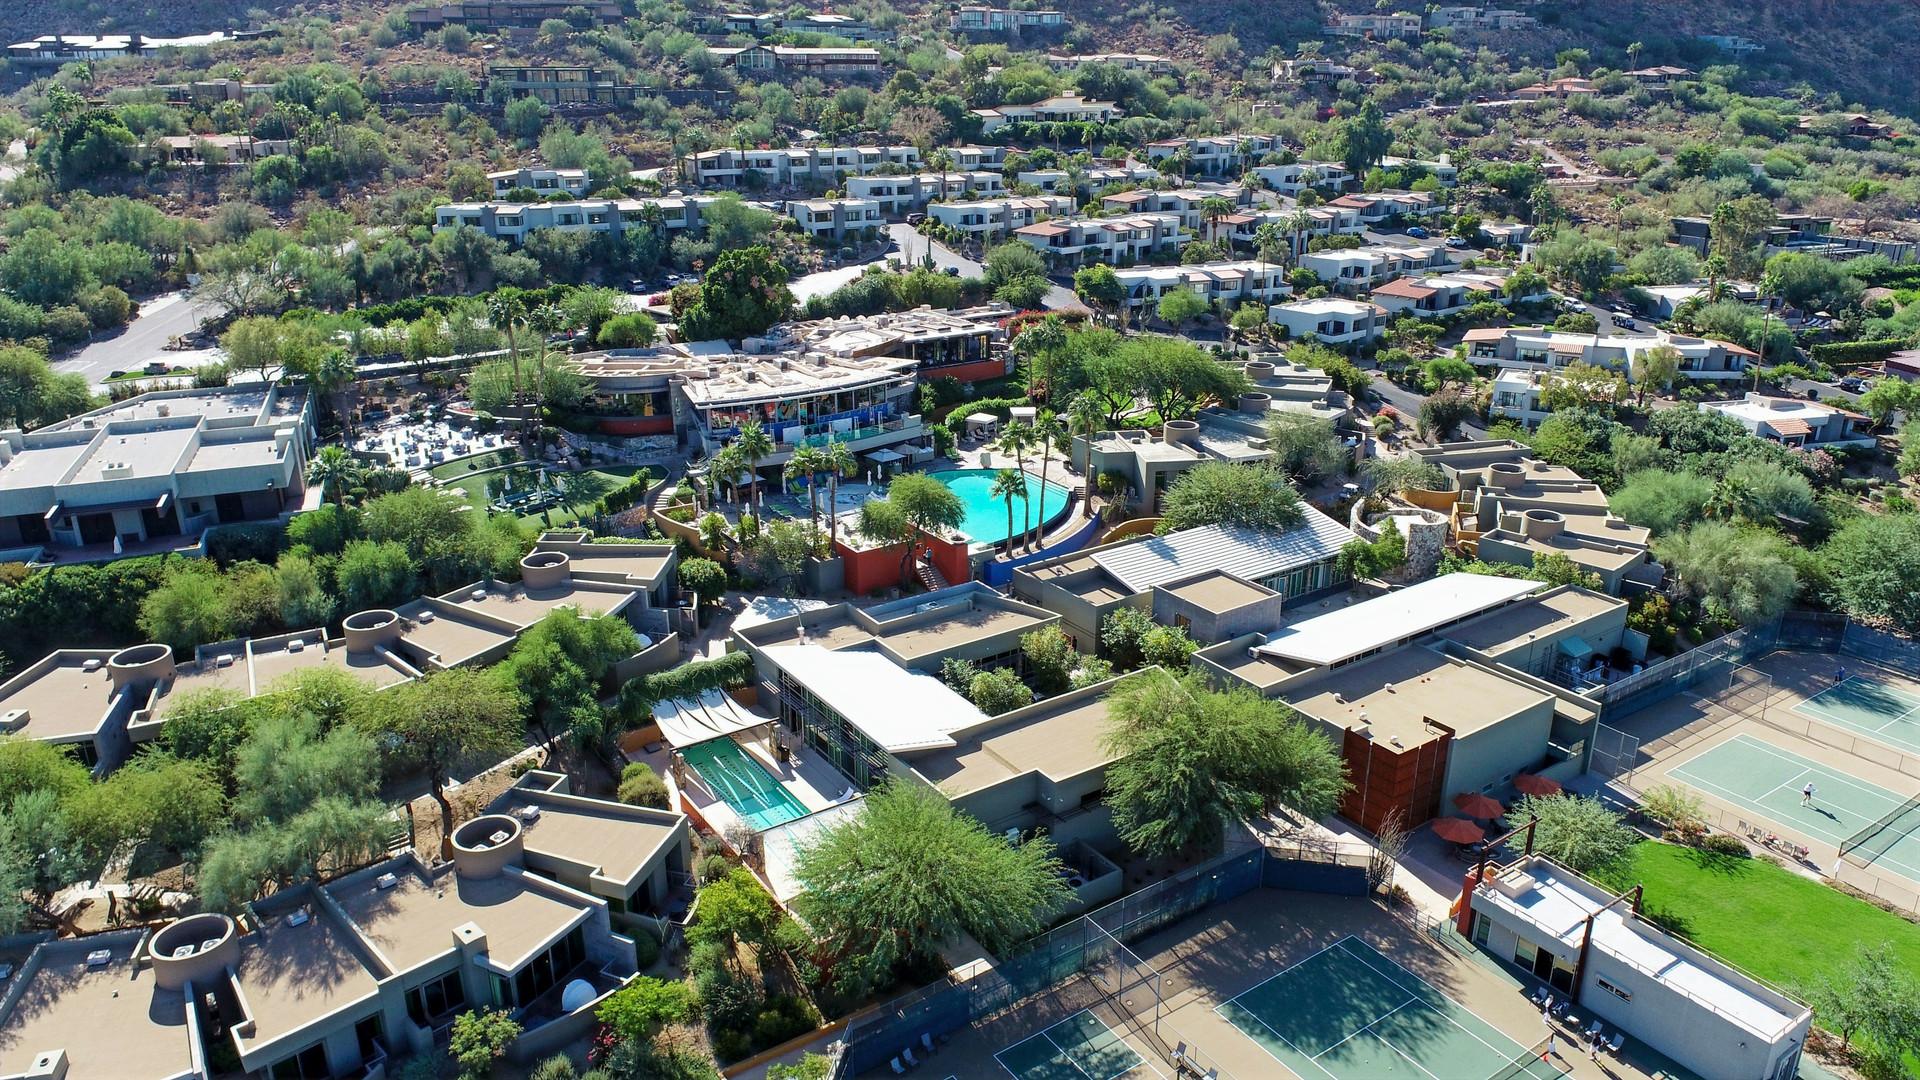 Sanctuary at Camelback Mountain Resort in Scottsdale, AZ